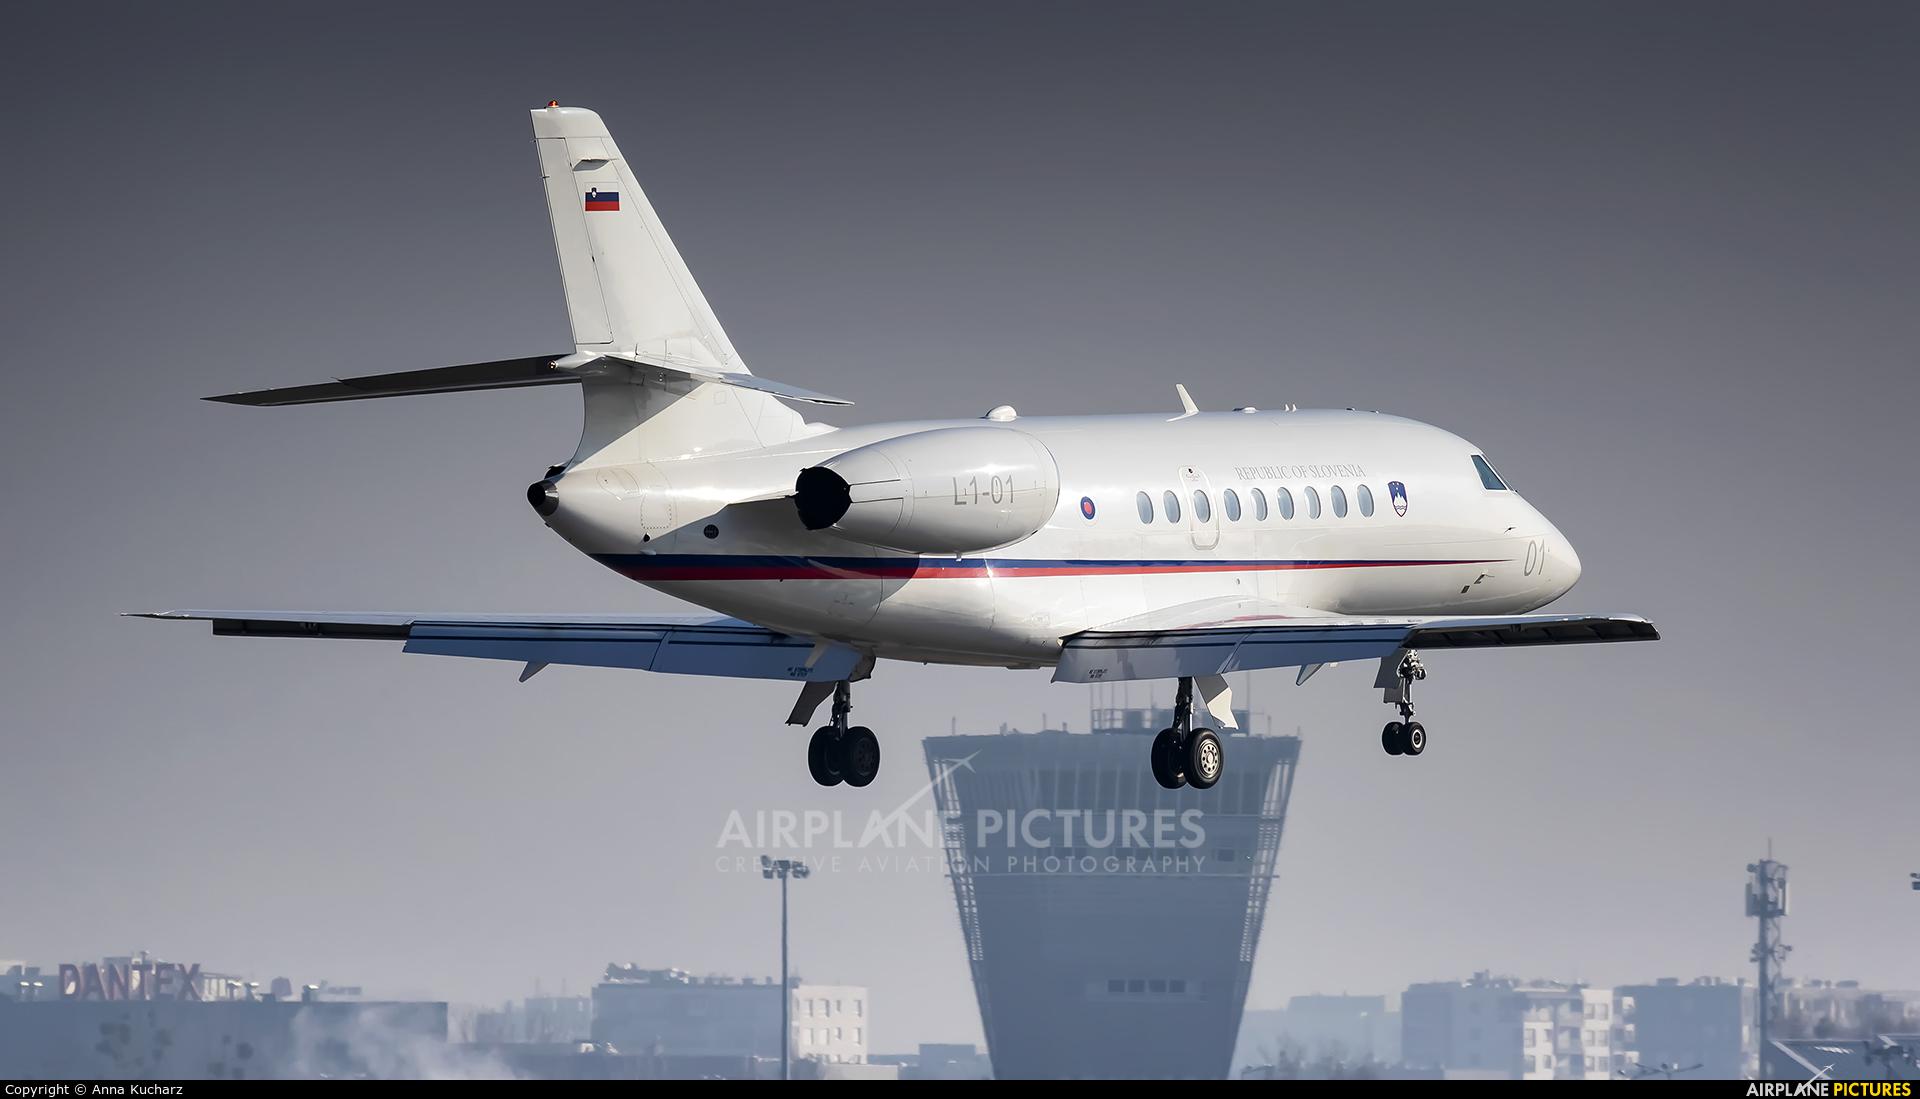 Slovenia - Government L1-01 aircraft at Warsaw - Frederic Chopin